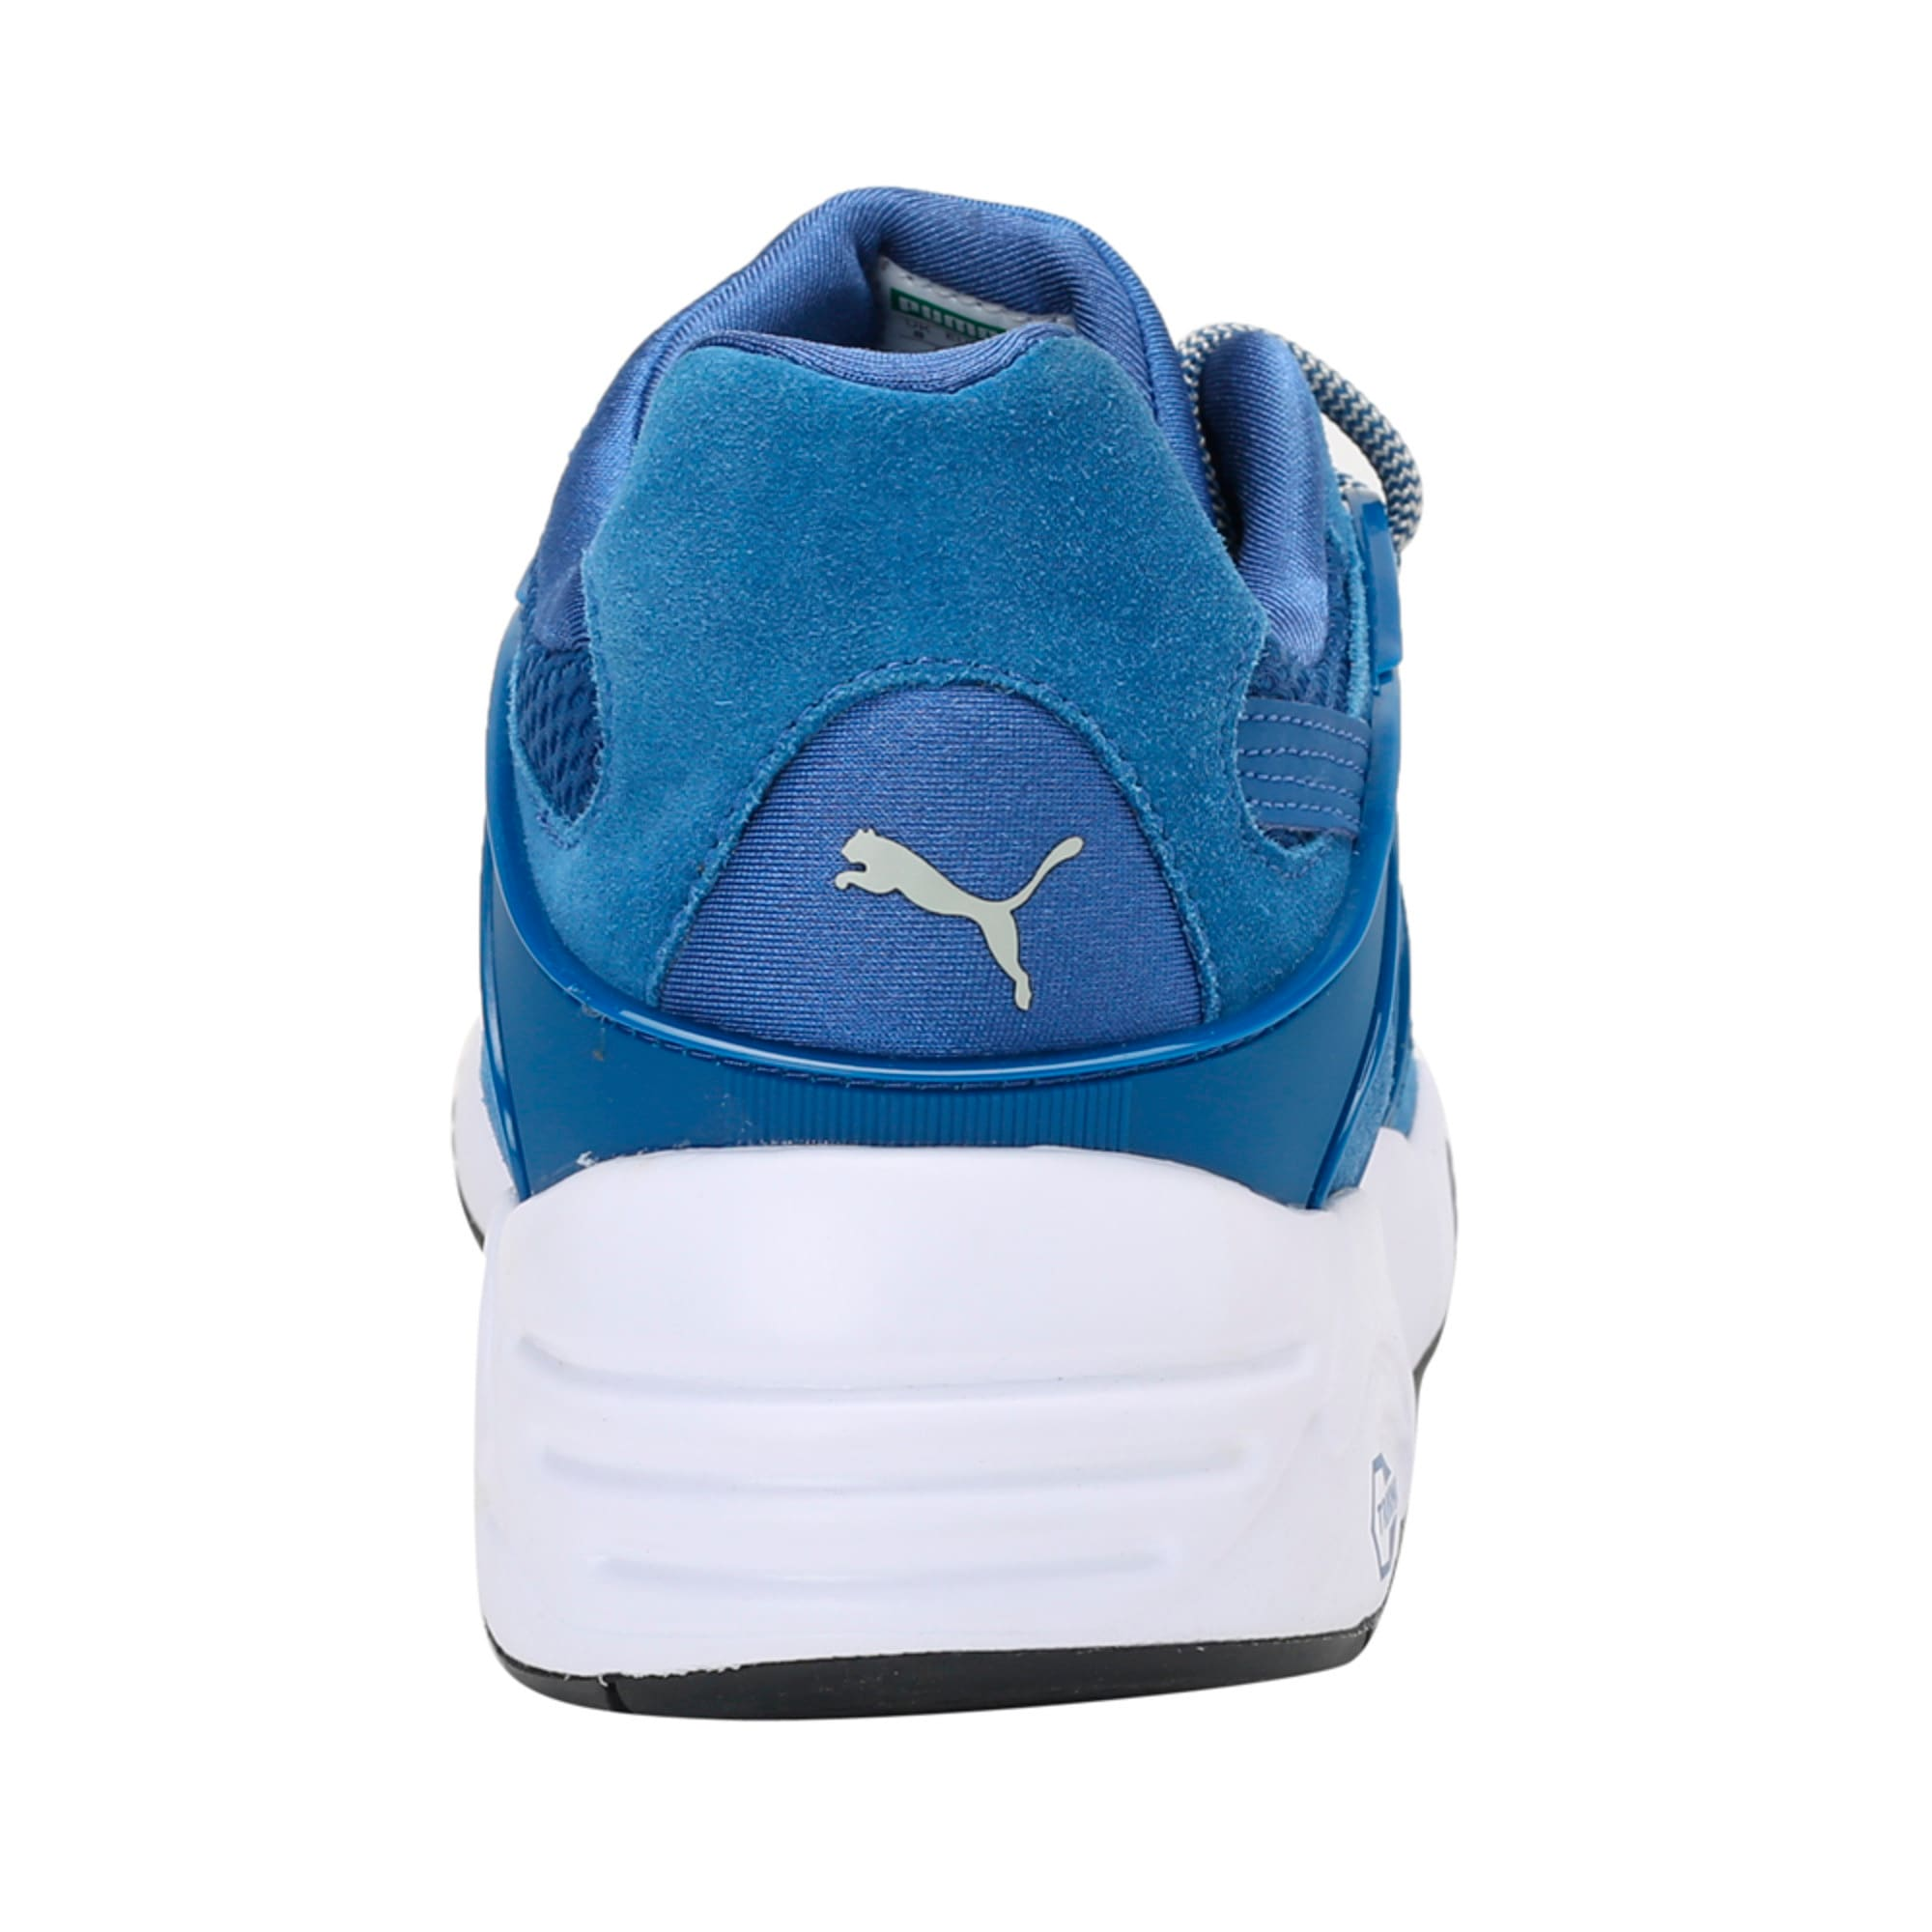 Thumbnail 4 of Blaze Trainers, TRUE BLUE-Puma White, medium-IND